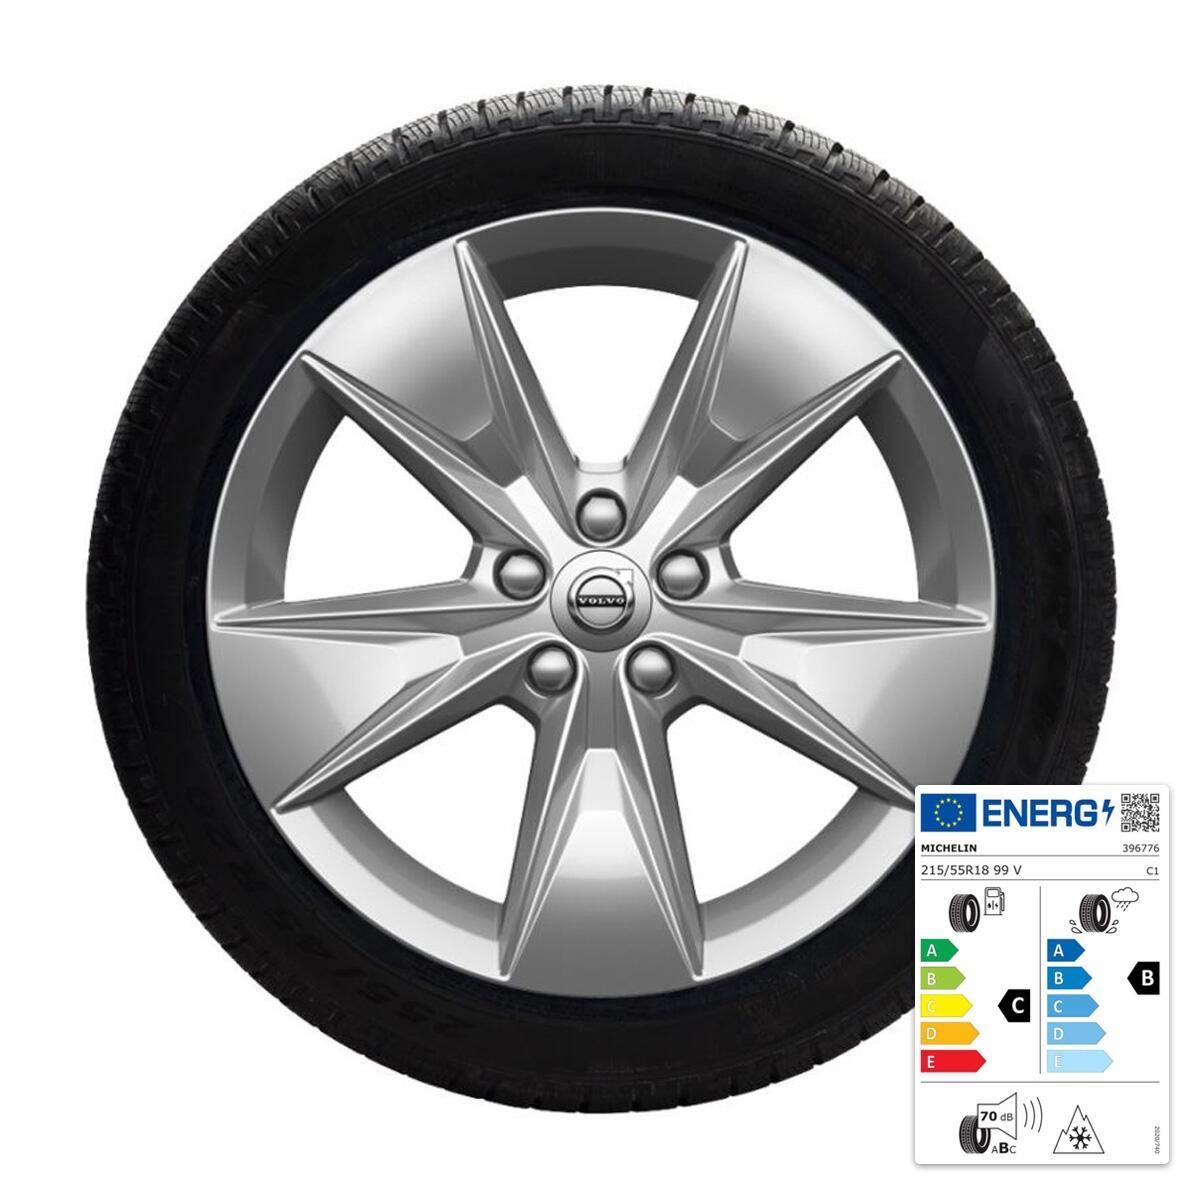 "Komplet zimskih koles:  45,70 cm (18""), pnevmatike Michelin"